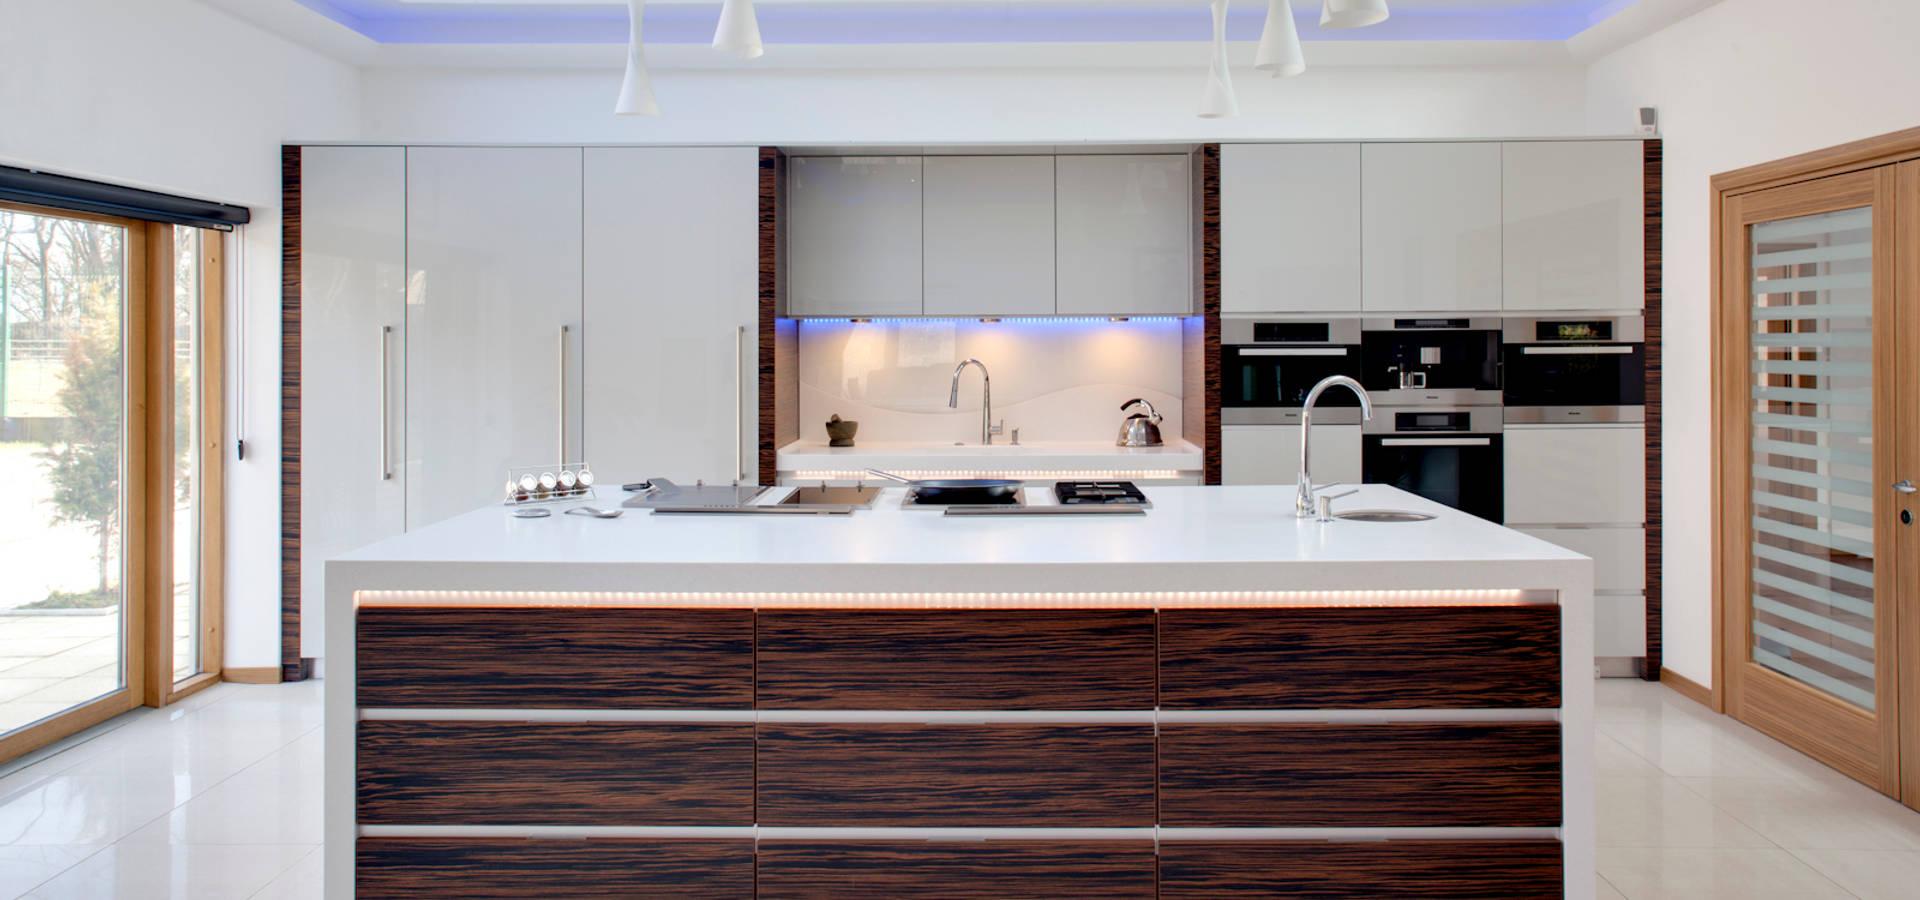 Stoneham Kitchens Produsen Dapur In Sidcup Homify